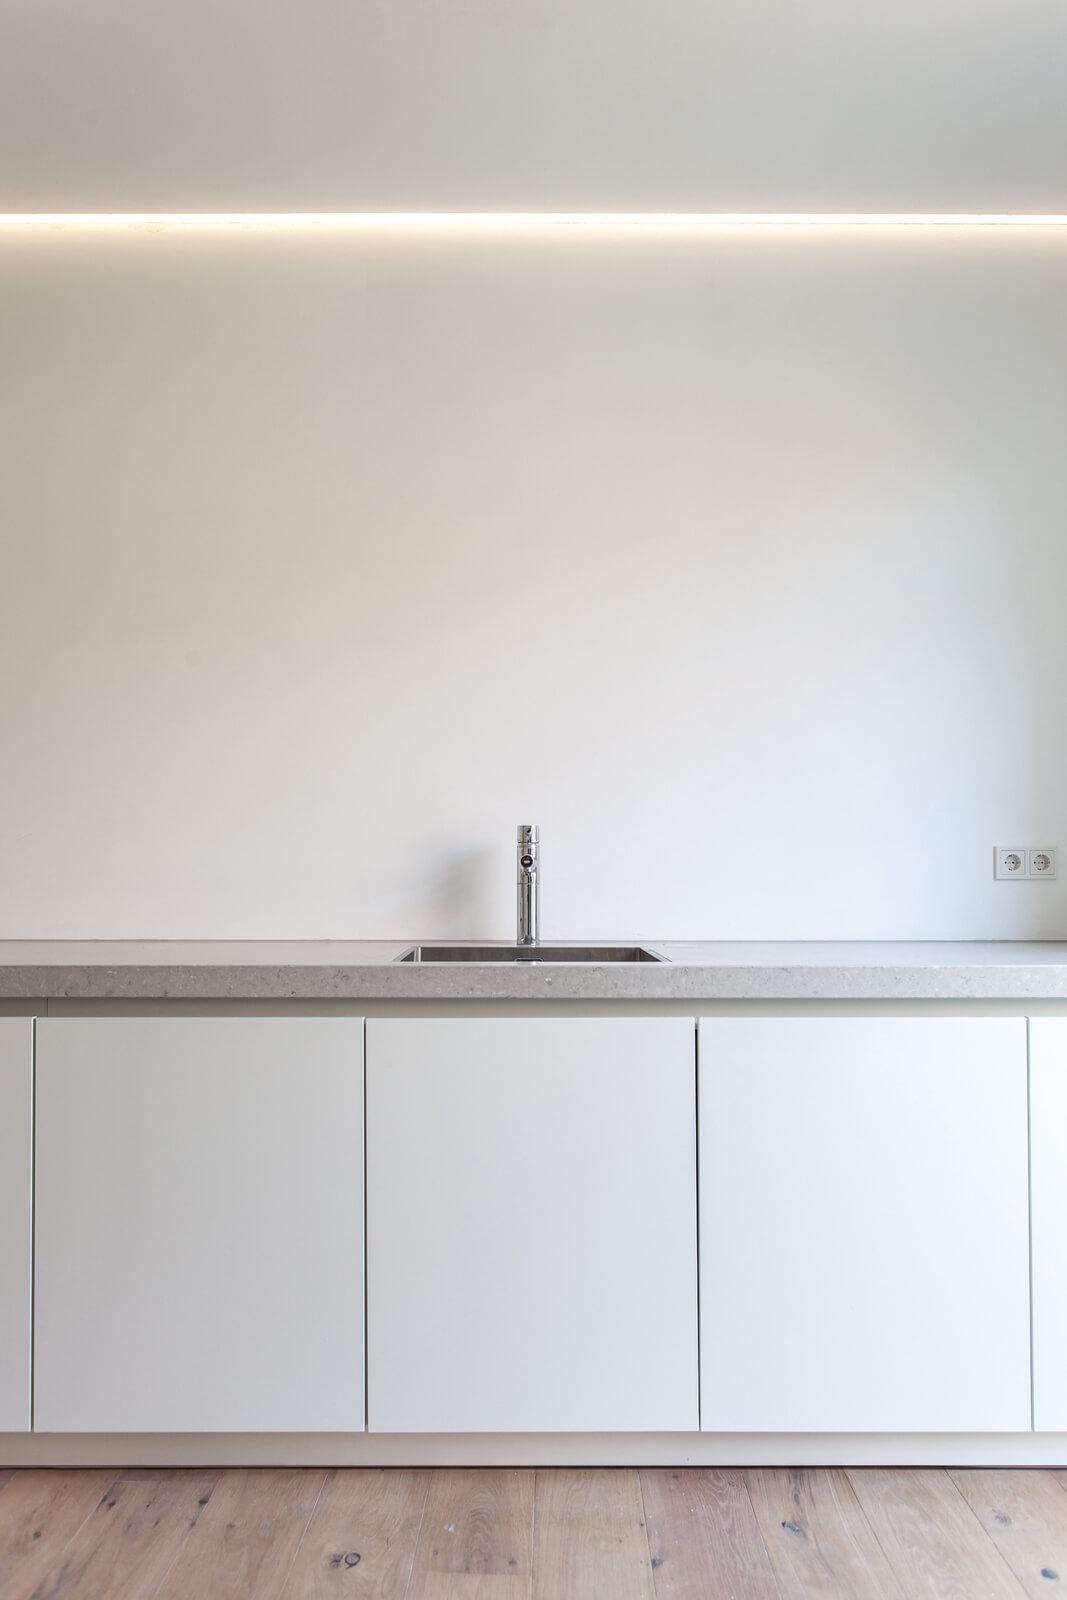 Daylight Award Flushglaze brengt daglicht in keuken